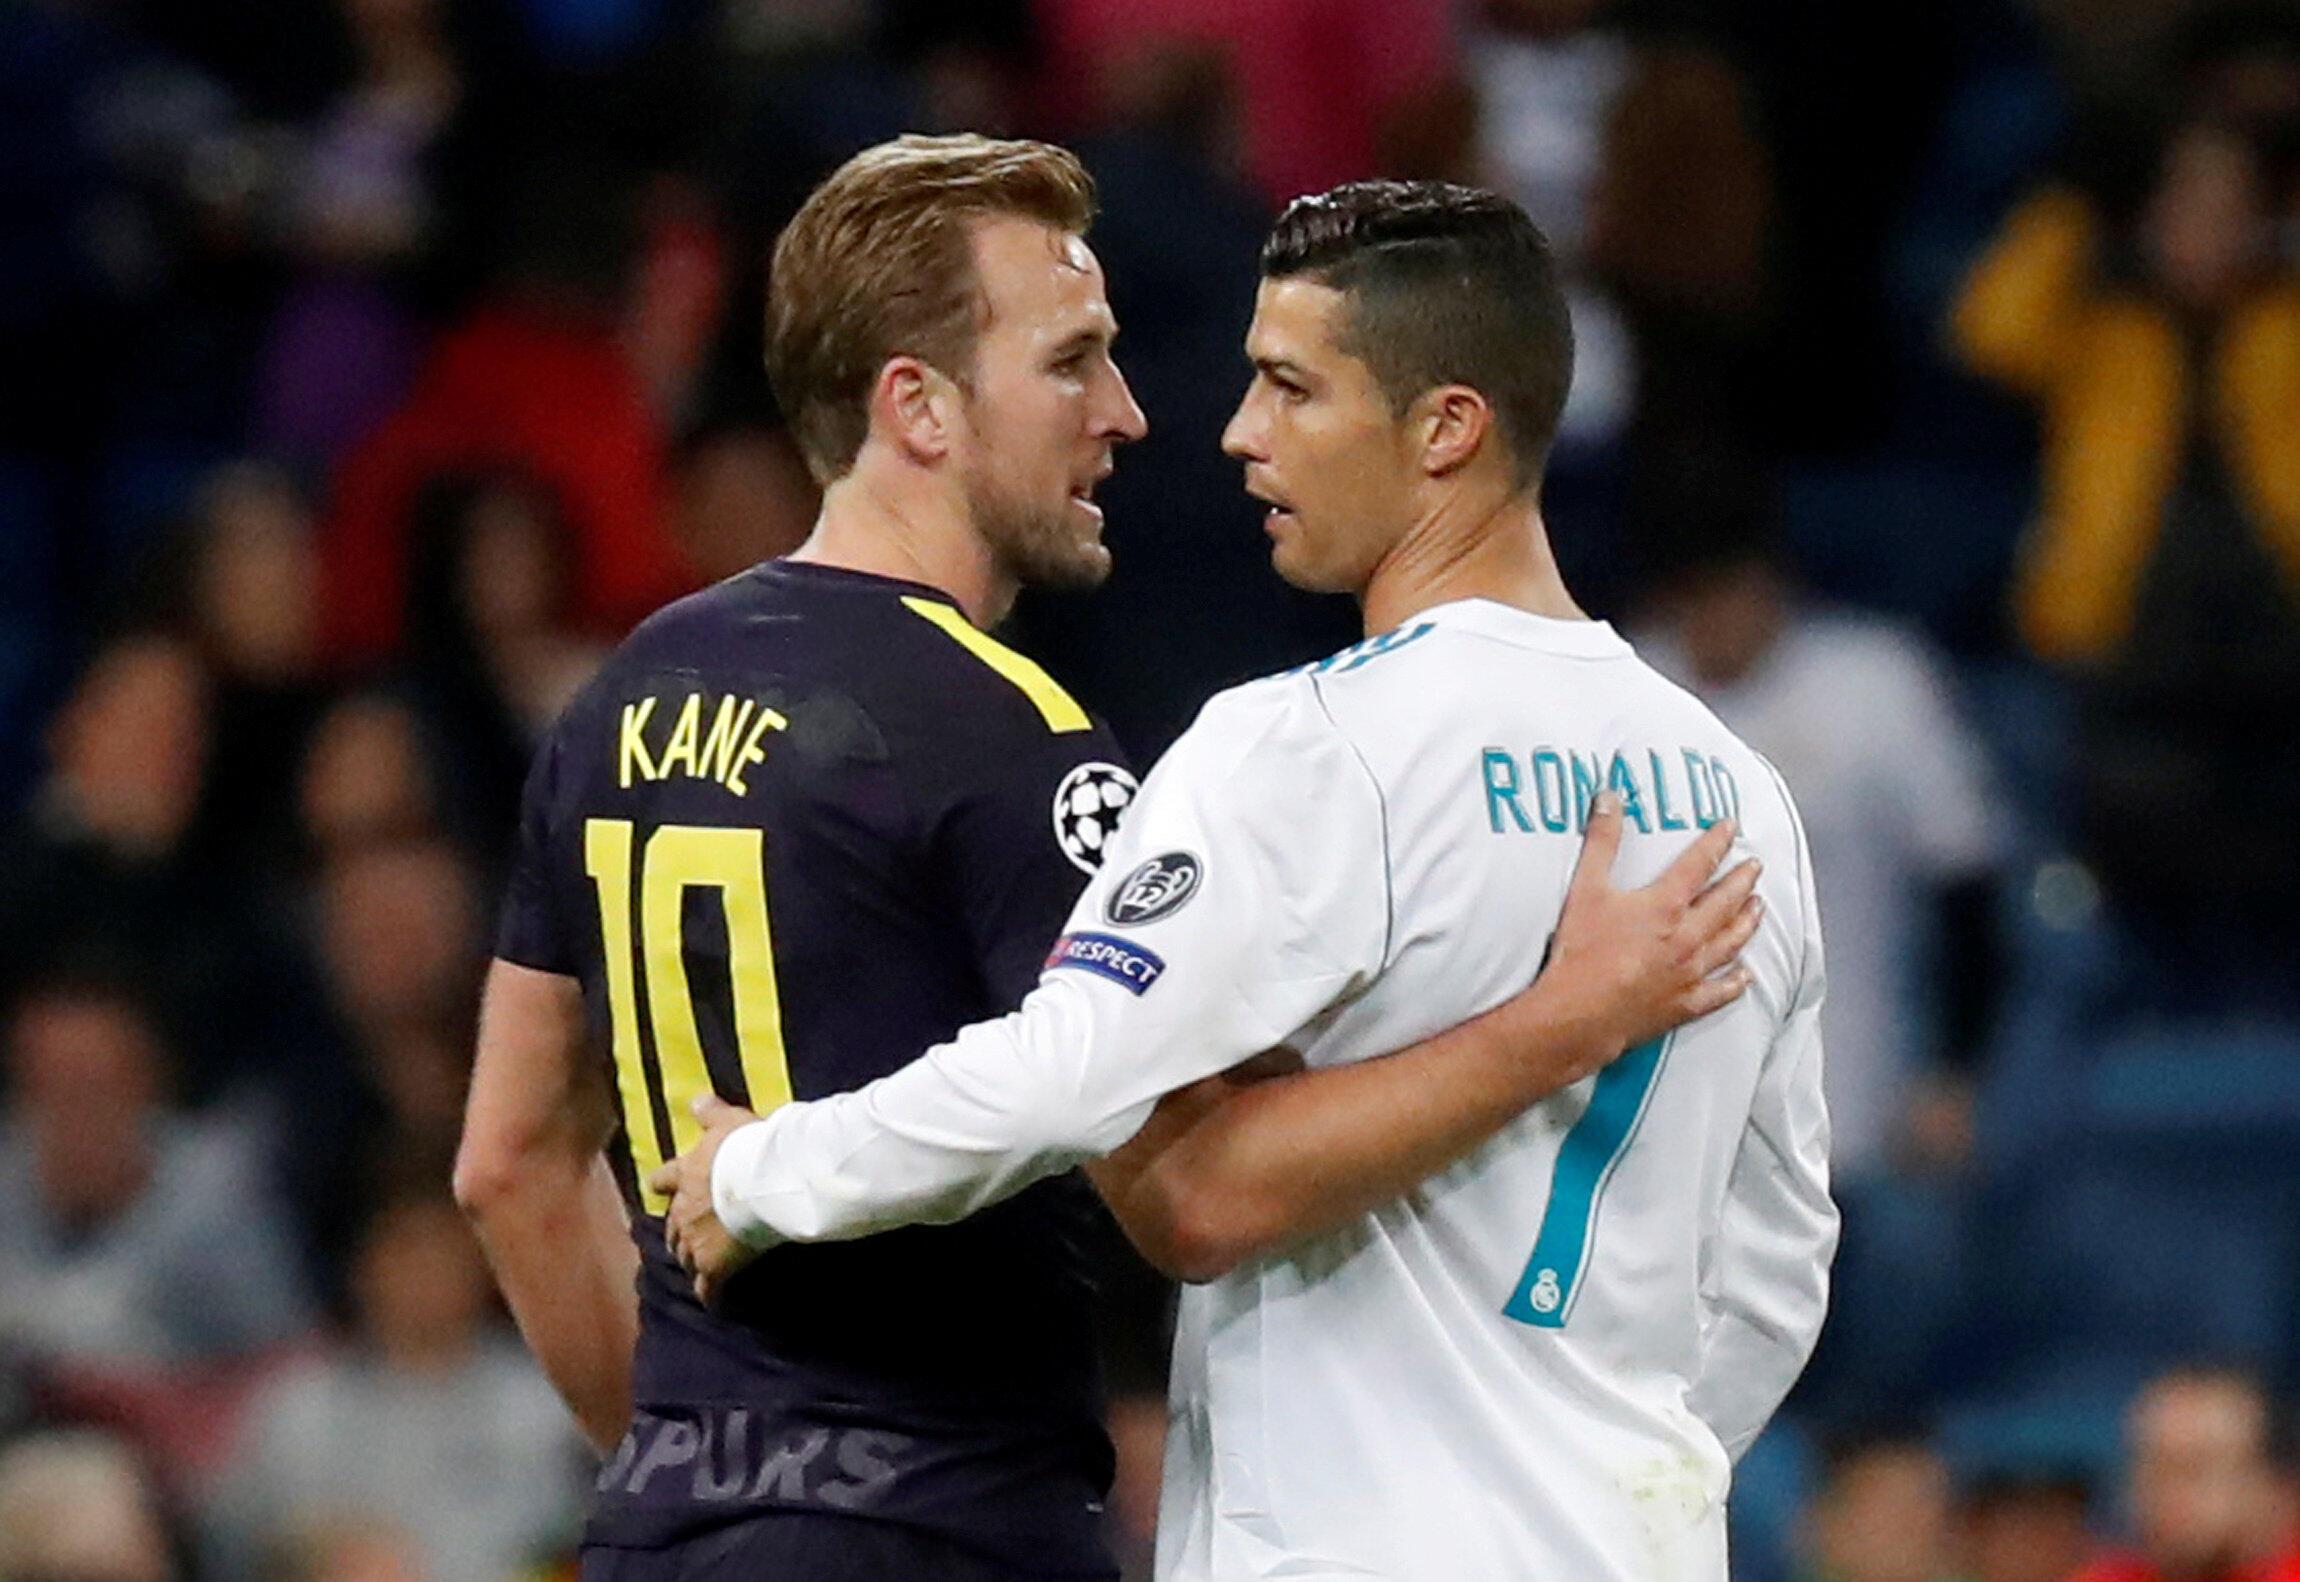 Dan wasan Tottenham Harry Kane da Cristiano Ronaldo na Real Madrid